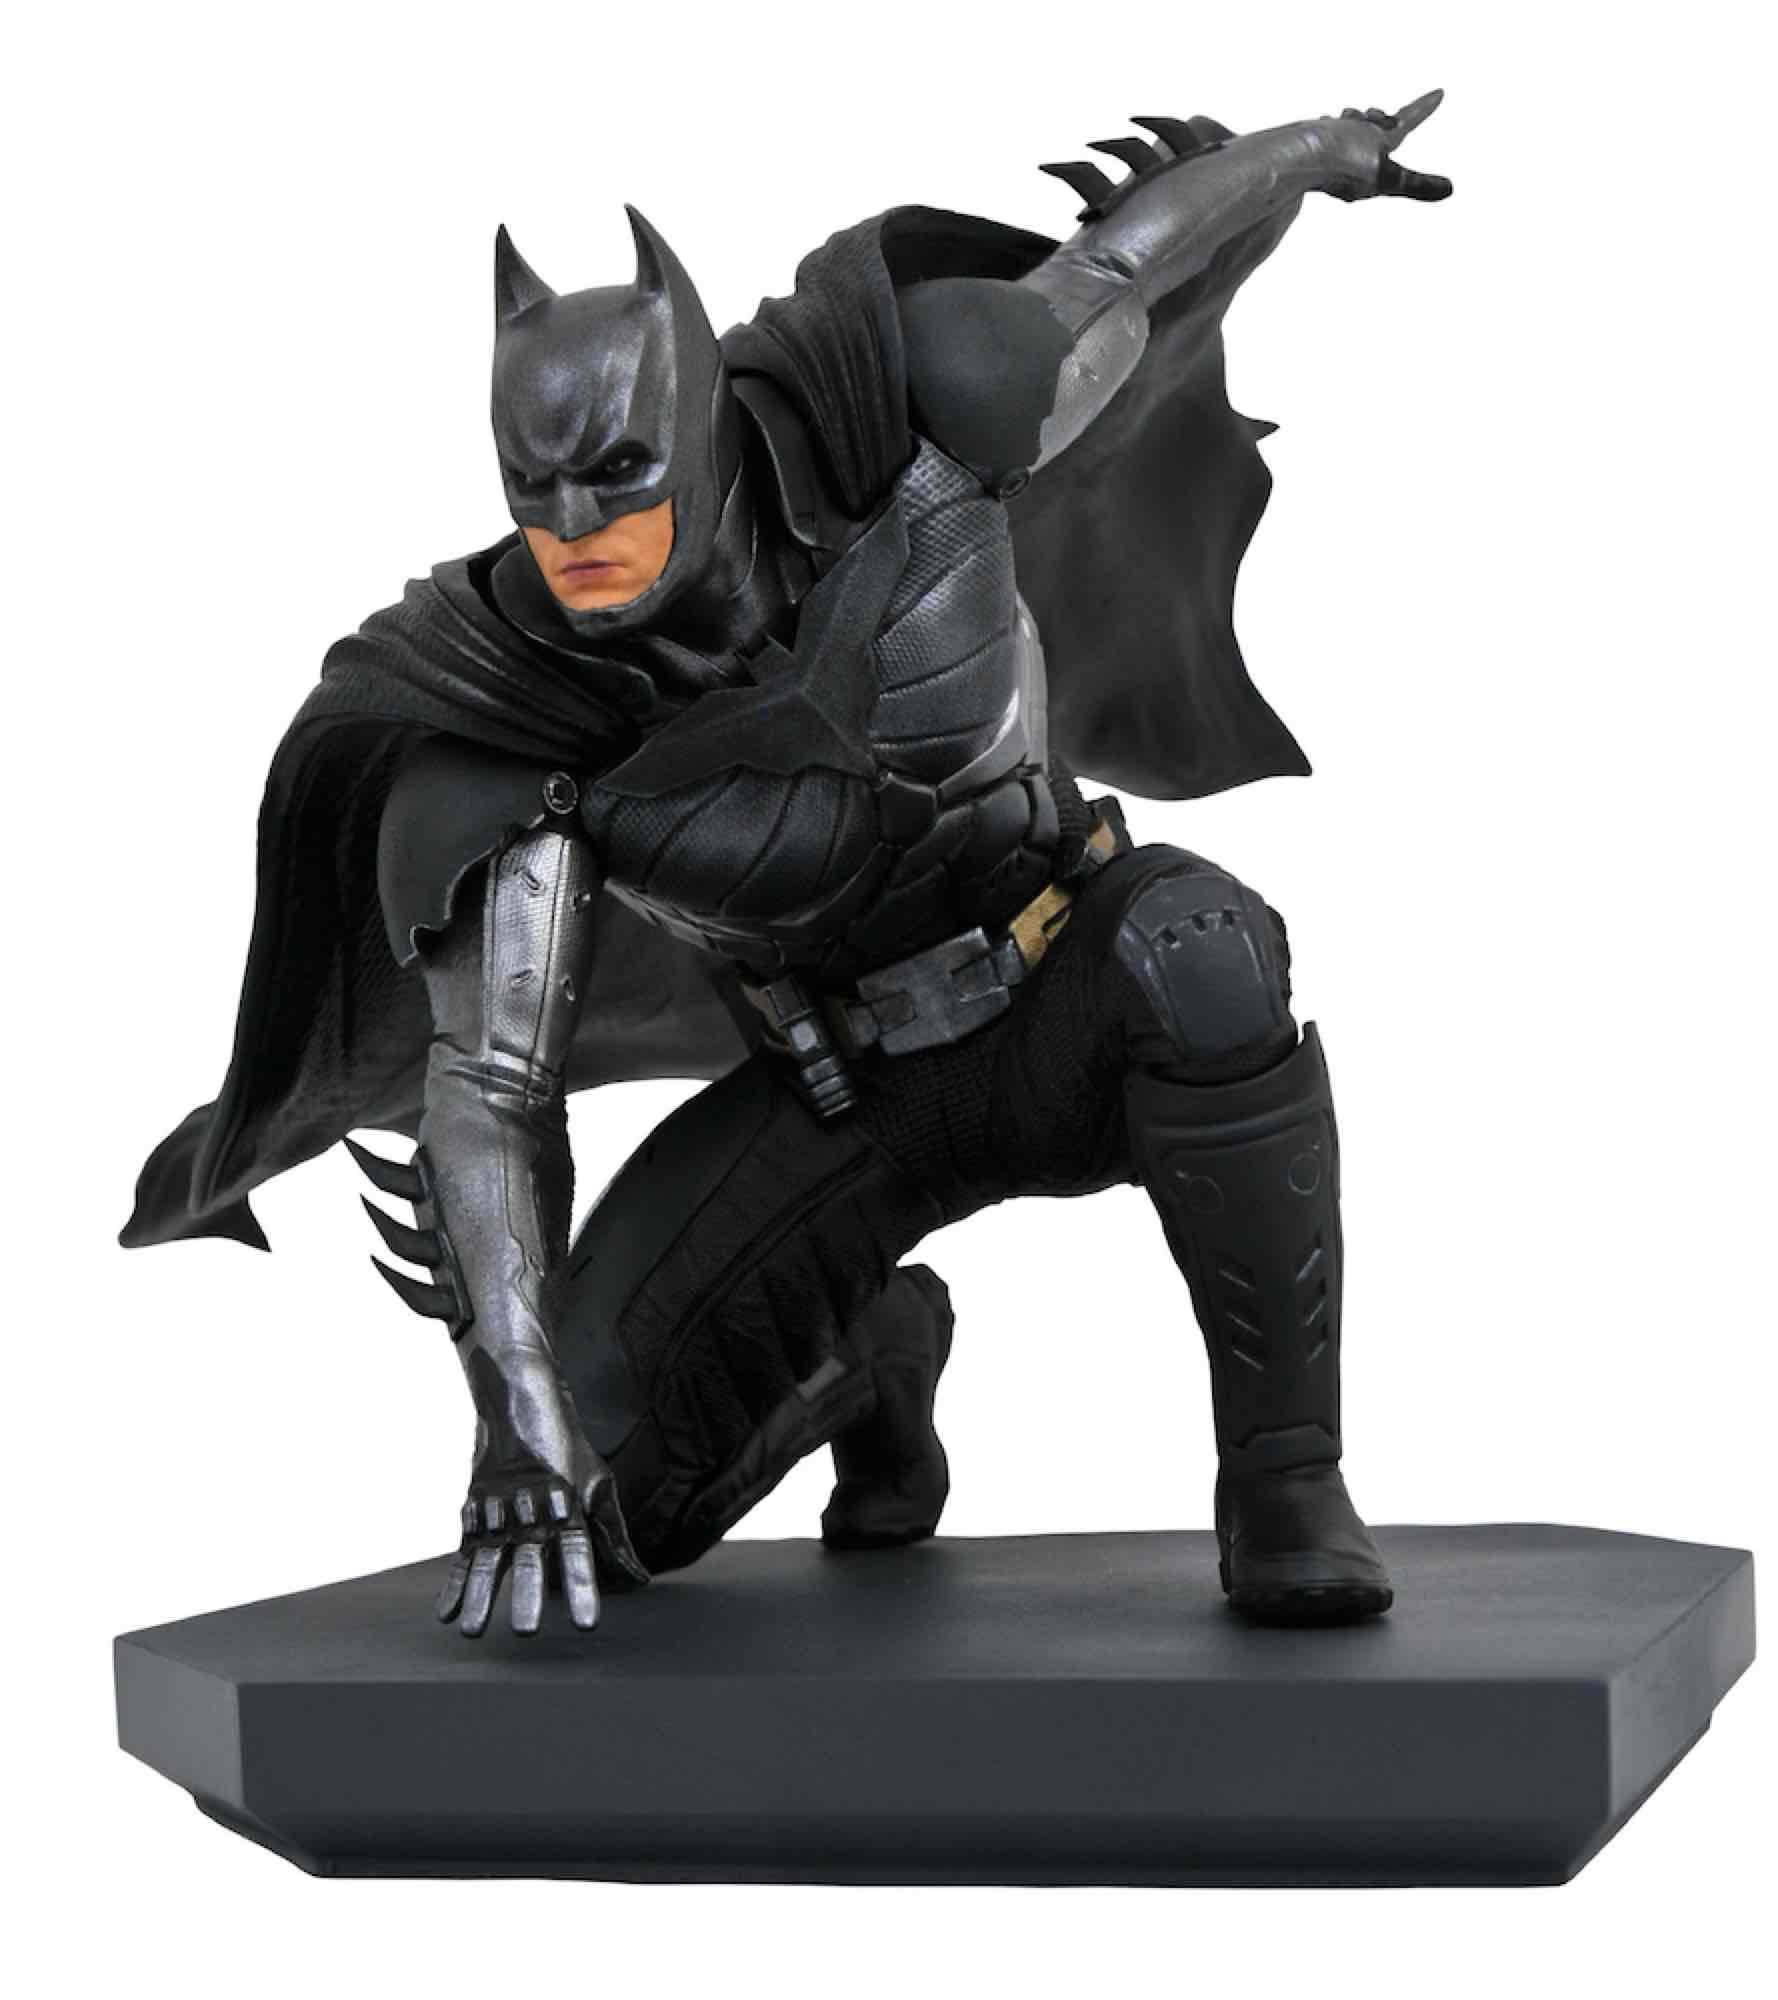 BATMAN FIGURA 15 CM INJUSTICE 2 DC VIDEO GAME GALLERY